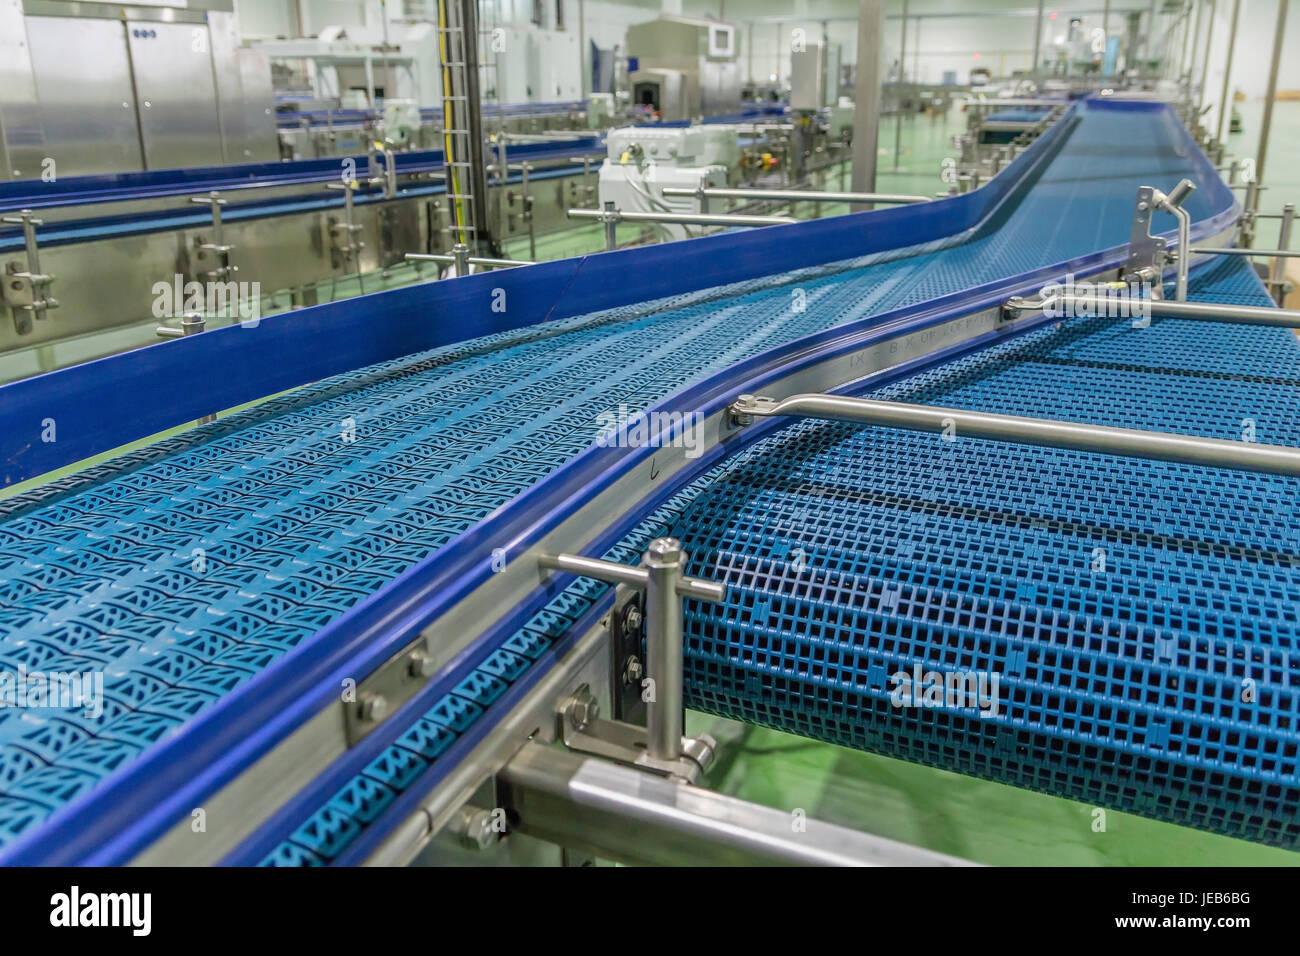 Empty conveyor belt of production line, part of industrial equipment - Stock Image